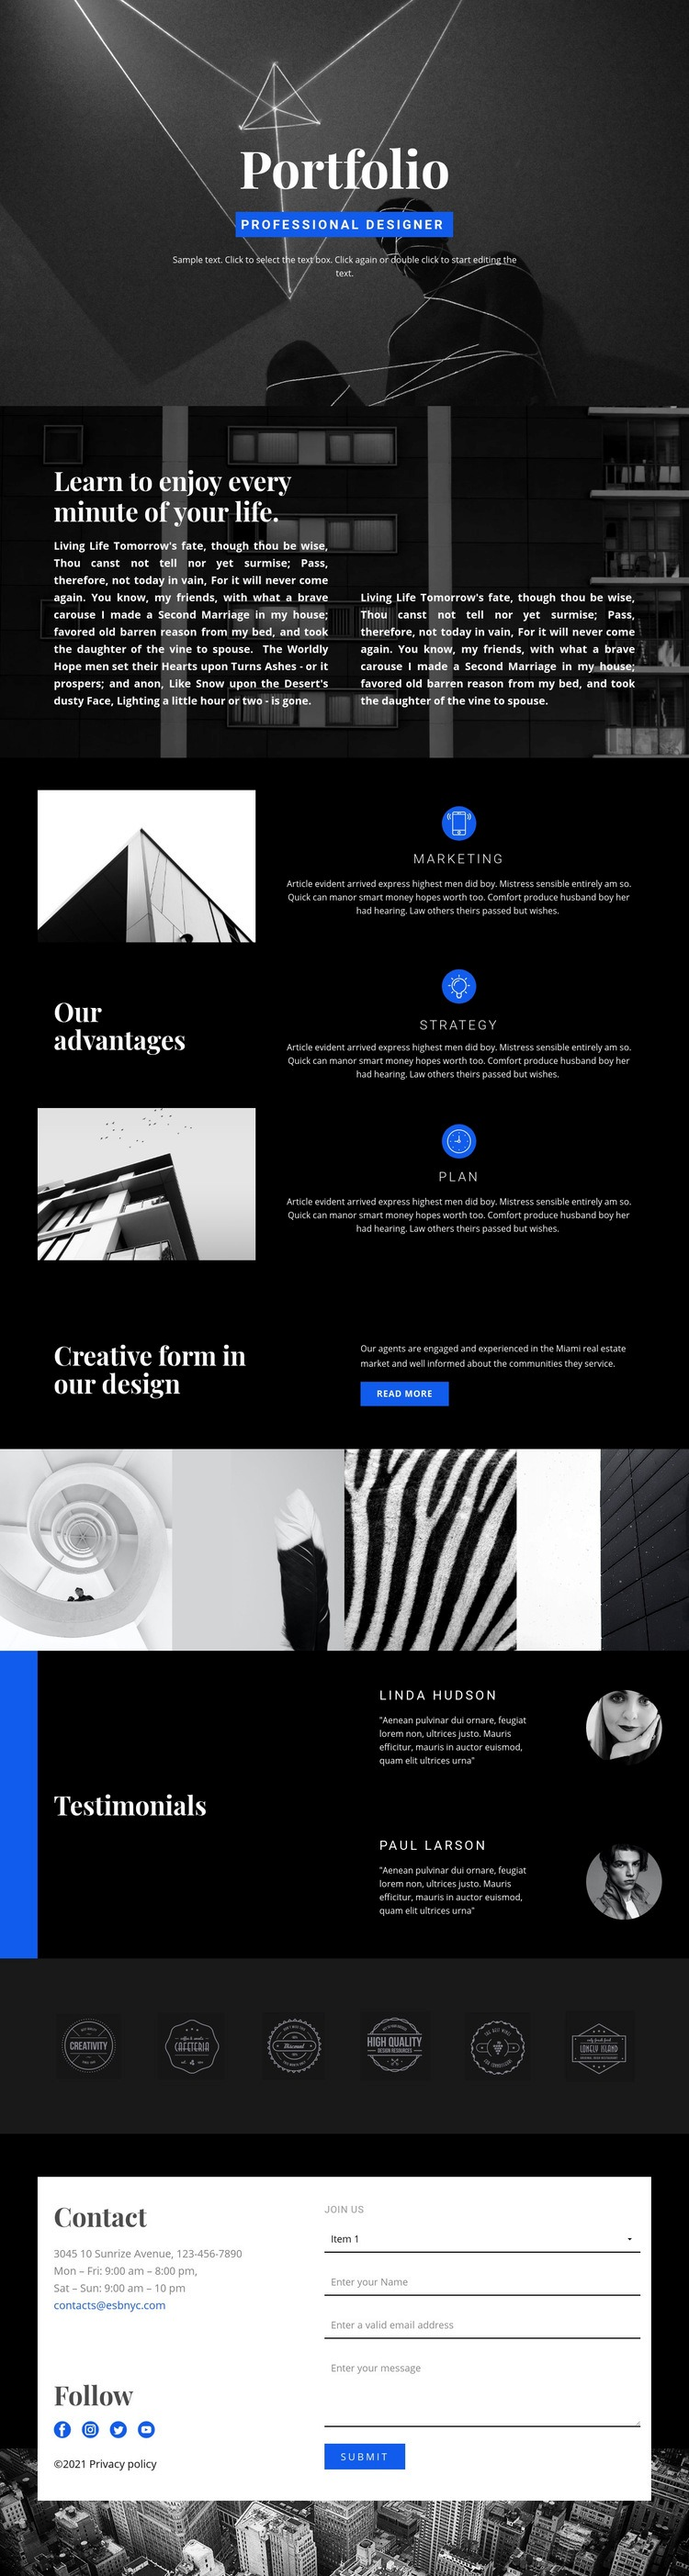 Fashion Designer Portfolio Wysiwyg Editor Html